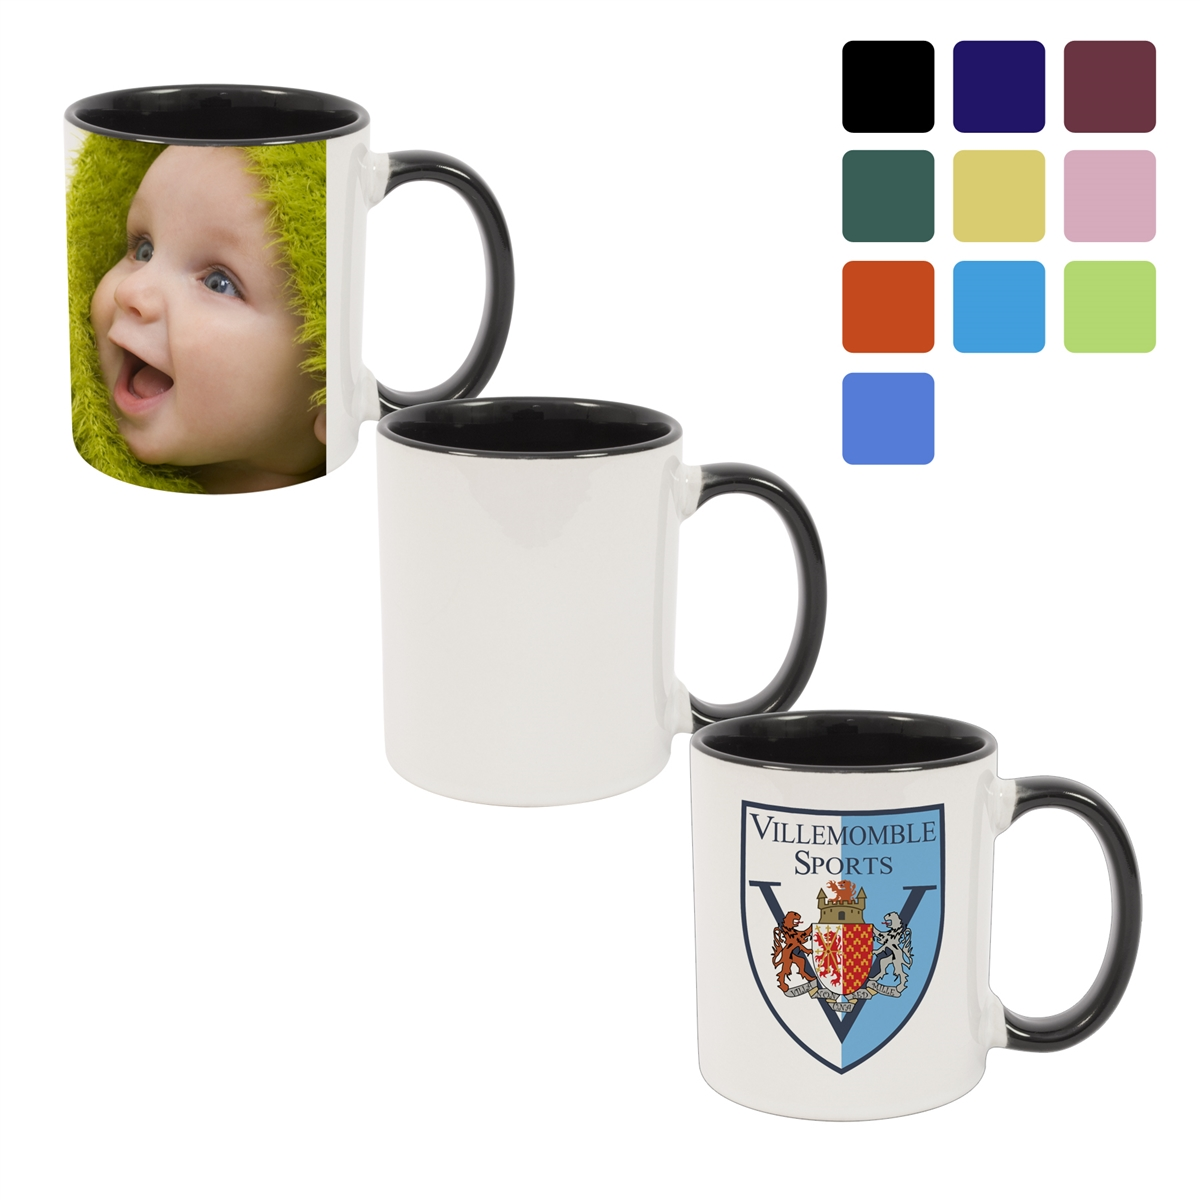 11oz color mug inner handle custom printing